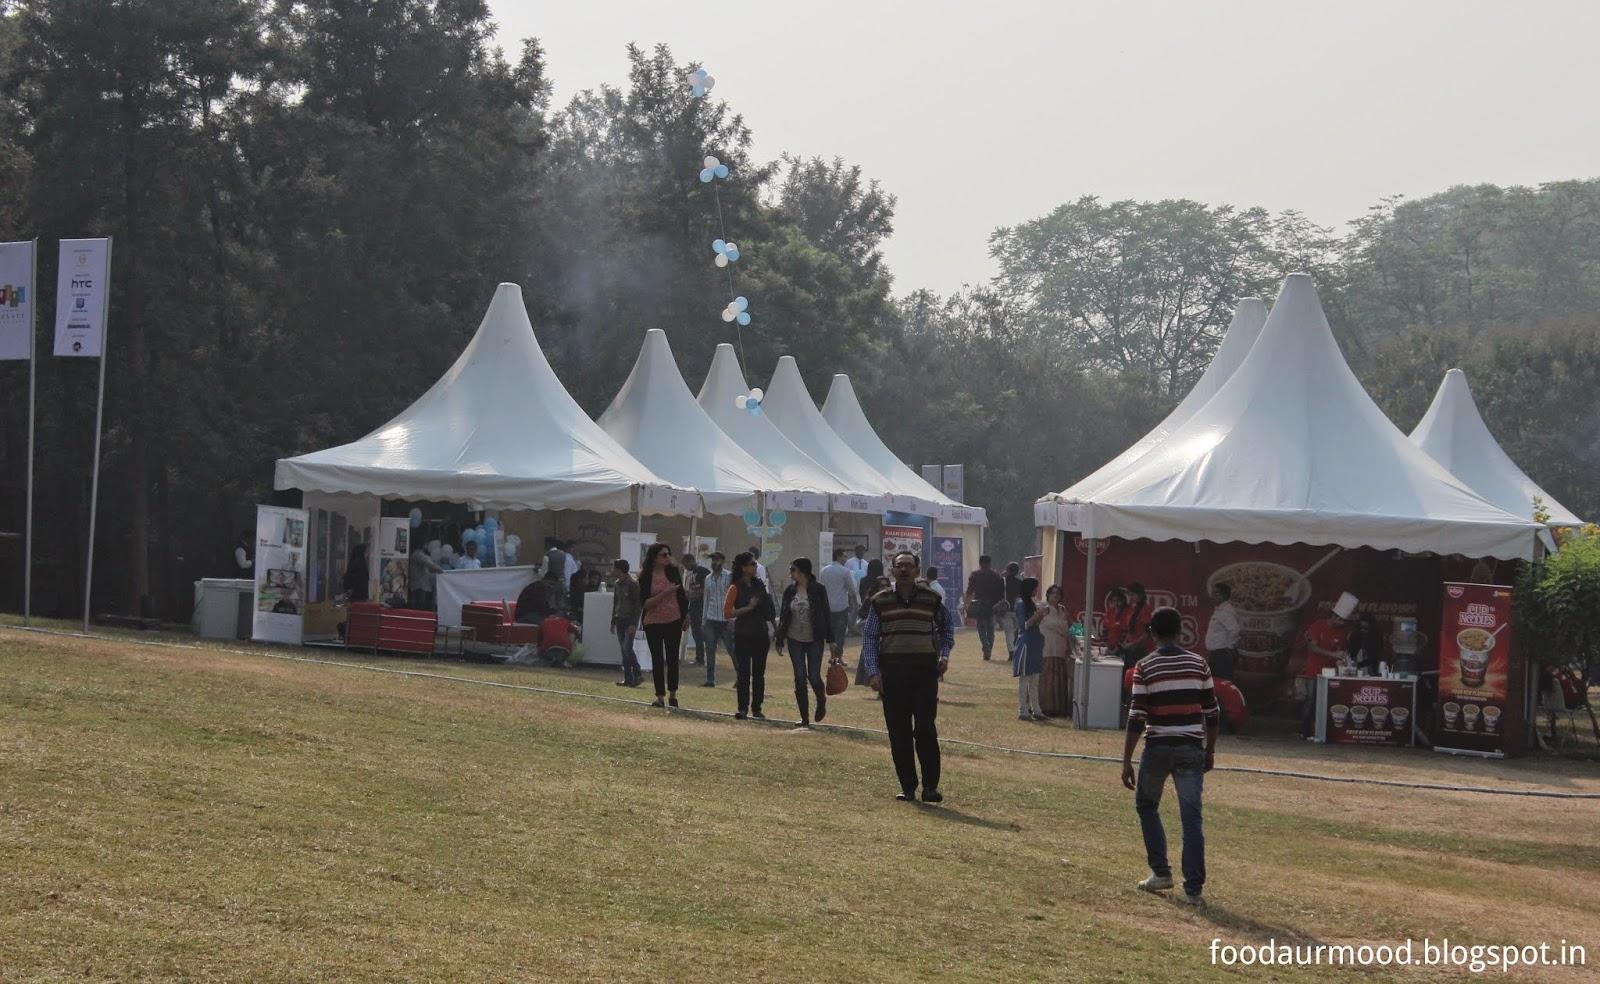 nehru park, delhi, food festival, food